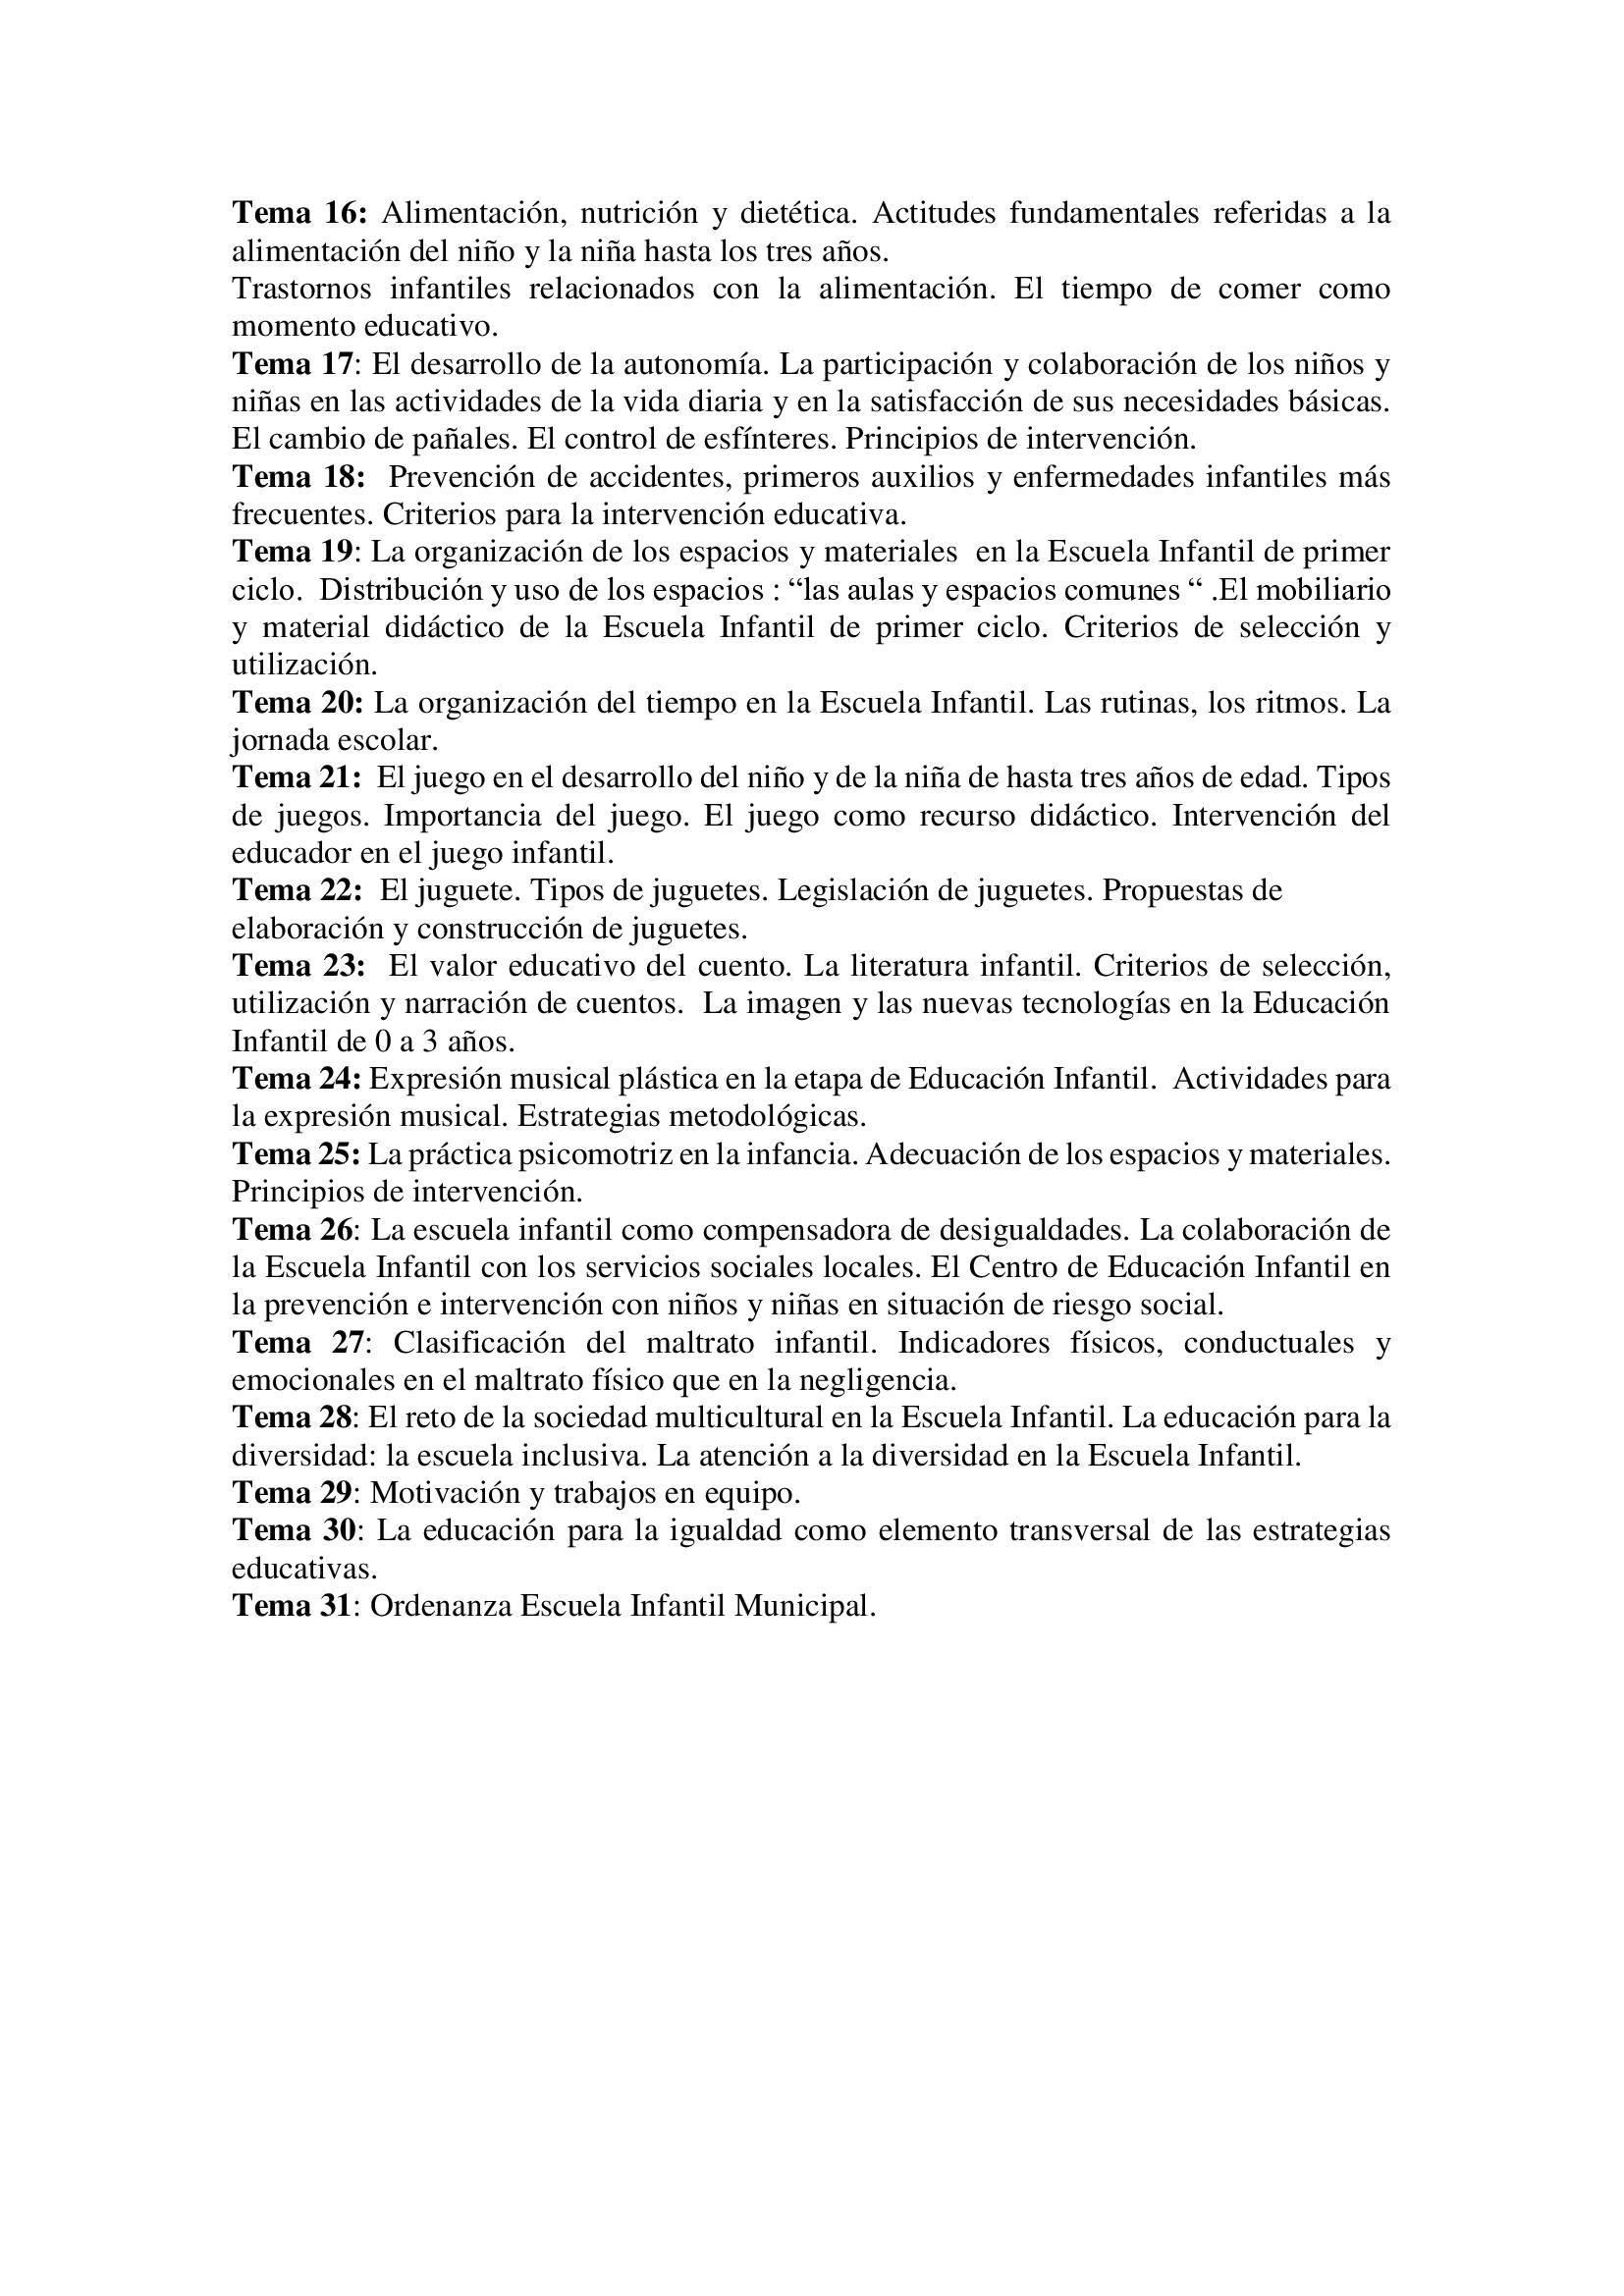 Bolsa de técnicos-as en educación infantil (2021) - Logrosán (Cáceres) 14